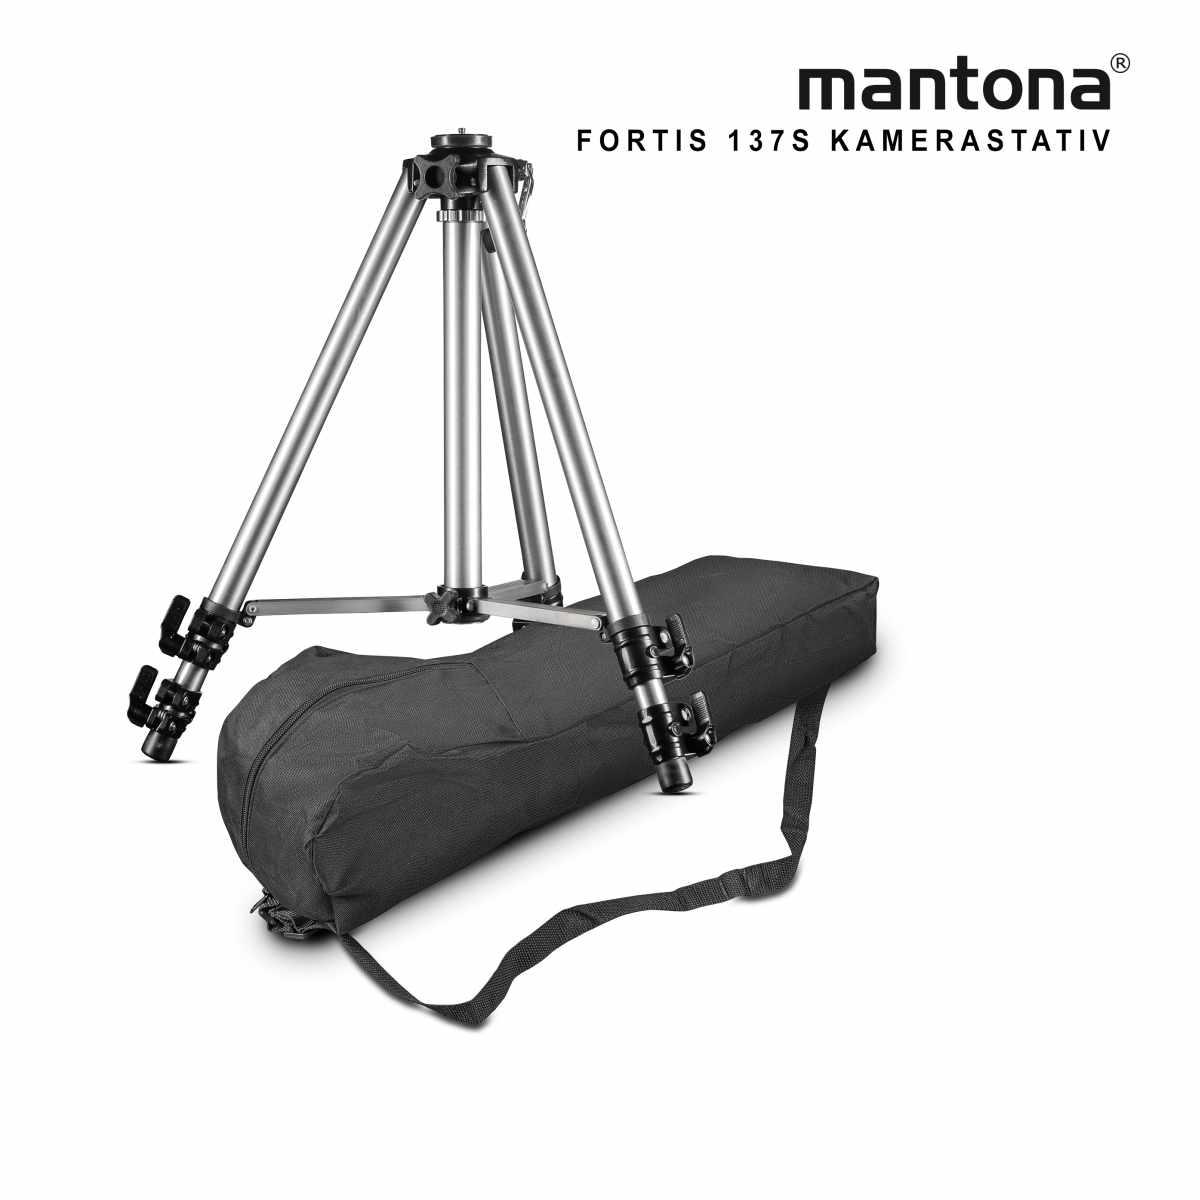 Mantona Basic Fortis 137S tripod